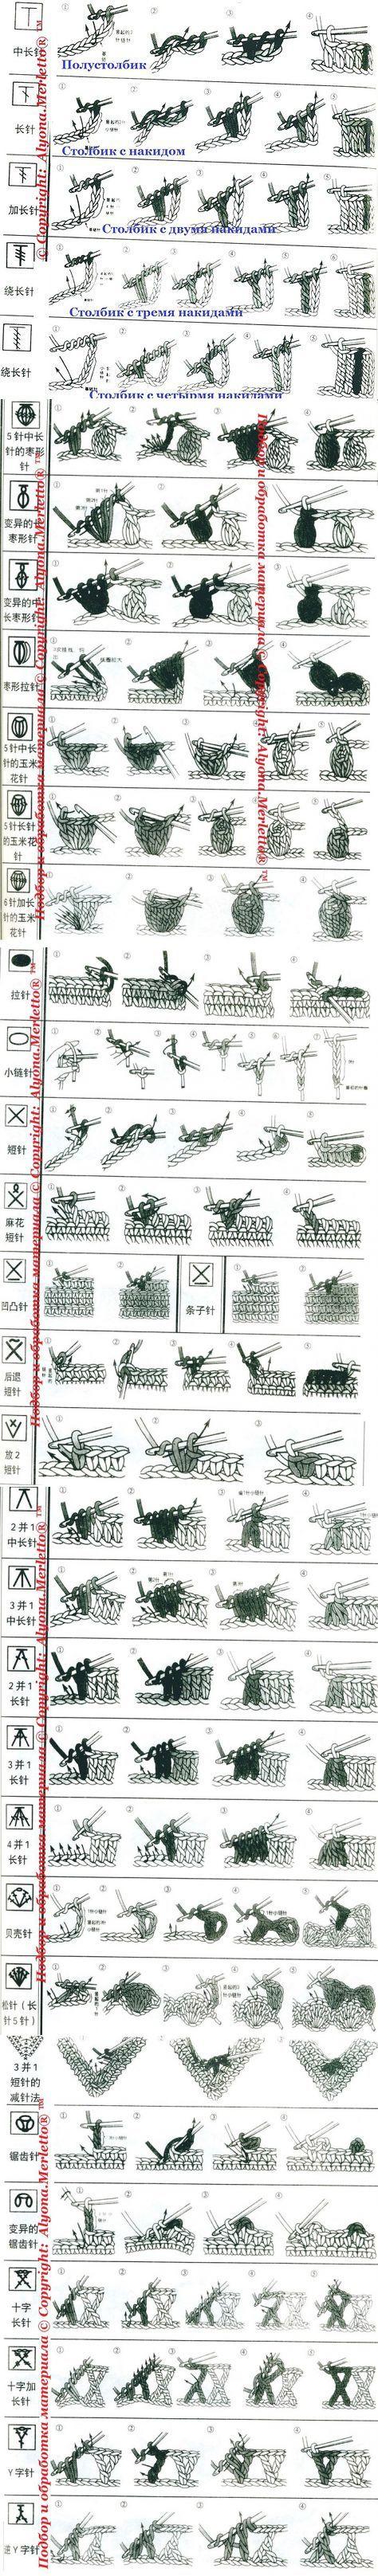 Decoding Chinese schemes ...